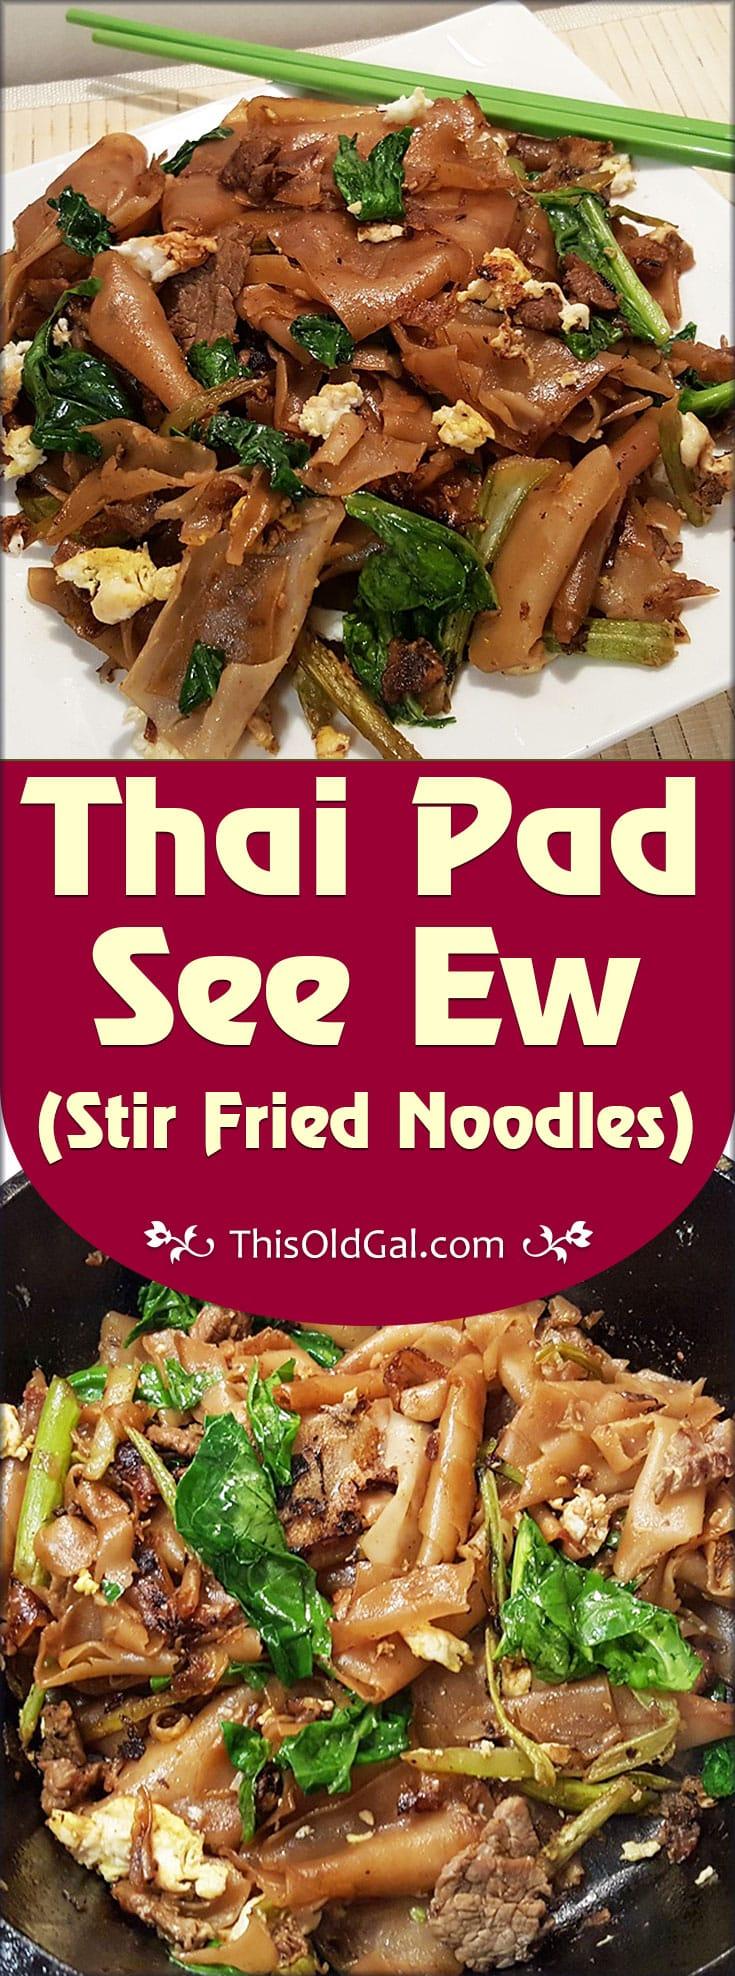 Thai pad see ew stir fried noodles this old gal thai pad see ew stir fried noodles ccuart Choice Image